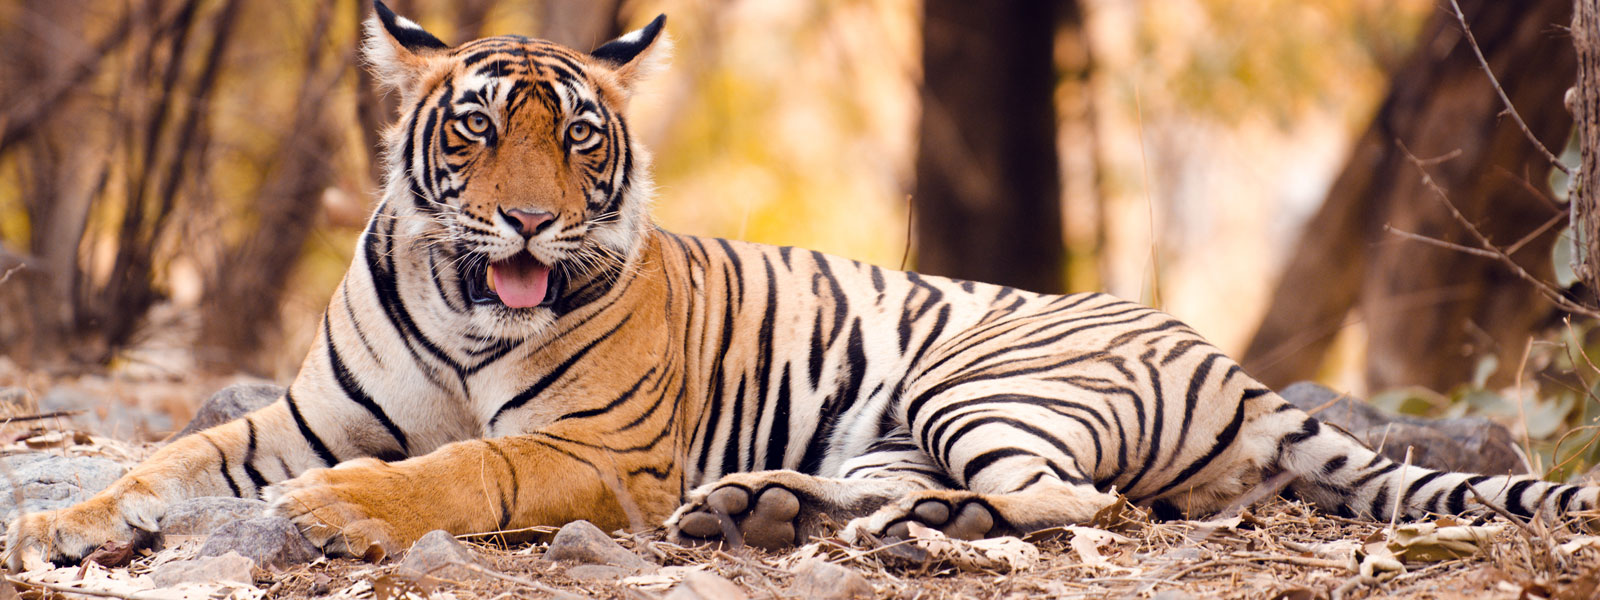 Tiger Ranthambore Tourism